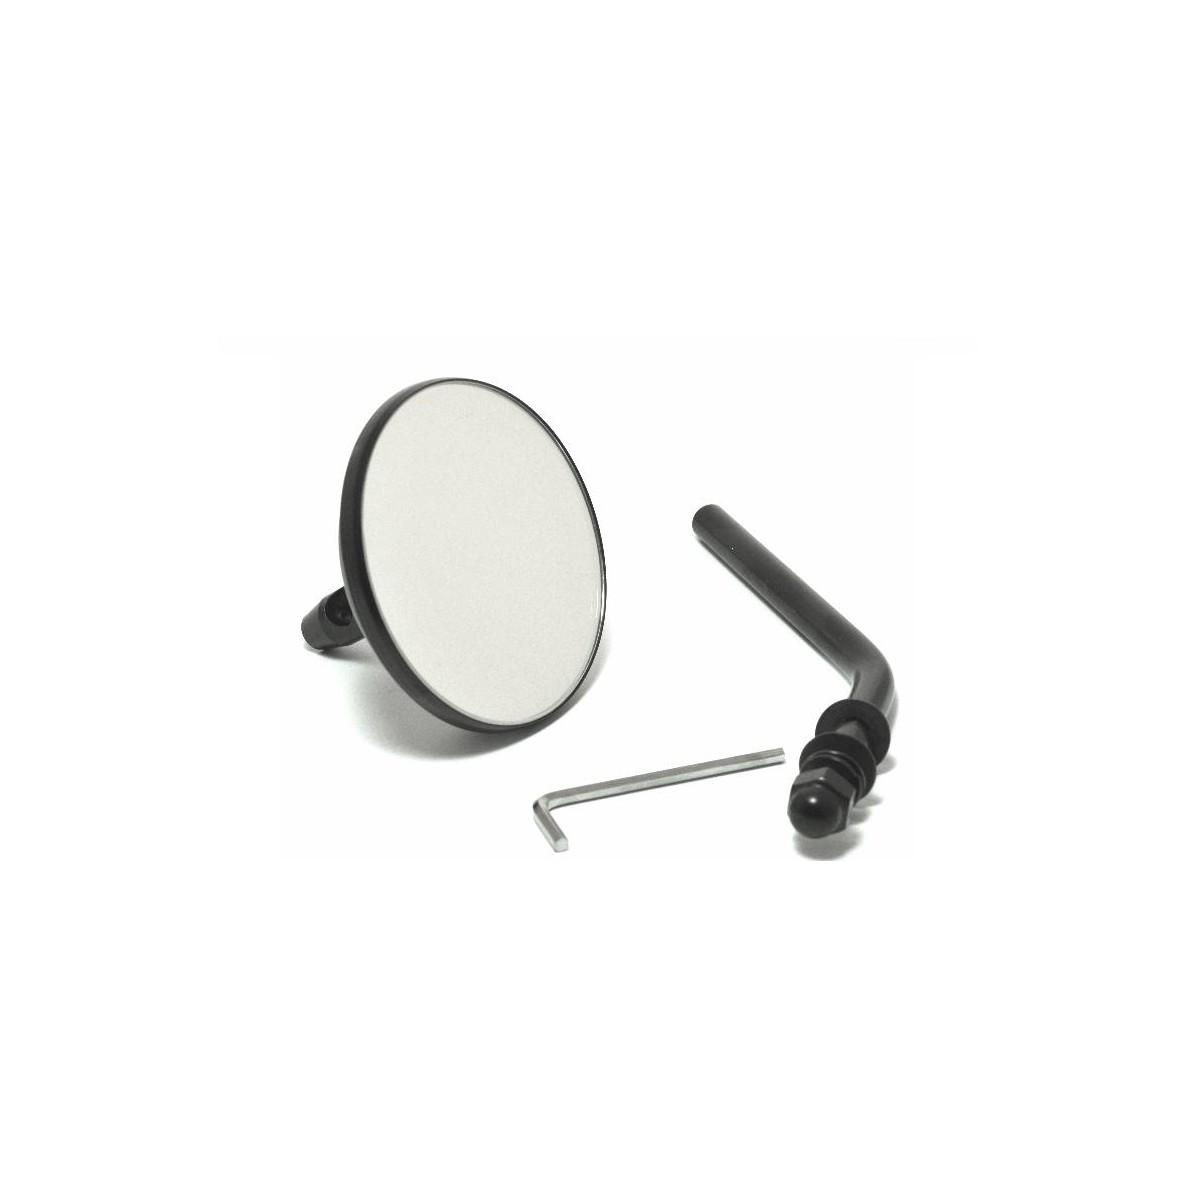 spiegel rund schwarz f r harley davidson bobber chopper. Black Bedroom Furniture Sets. Home Design Ideas